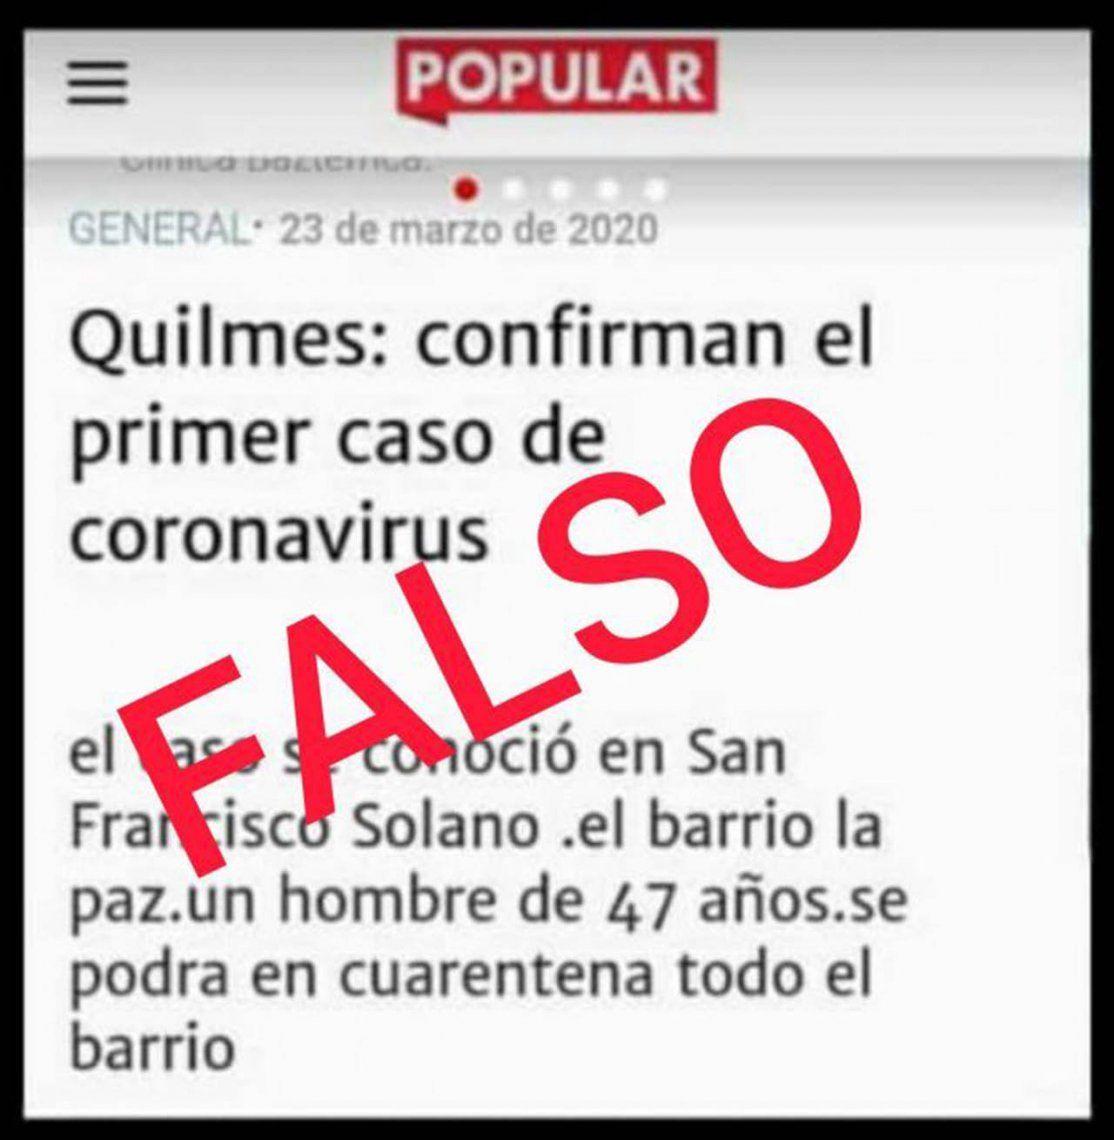 Fake News: viralizan falsa nota de Diario Popular sobre coronavirus